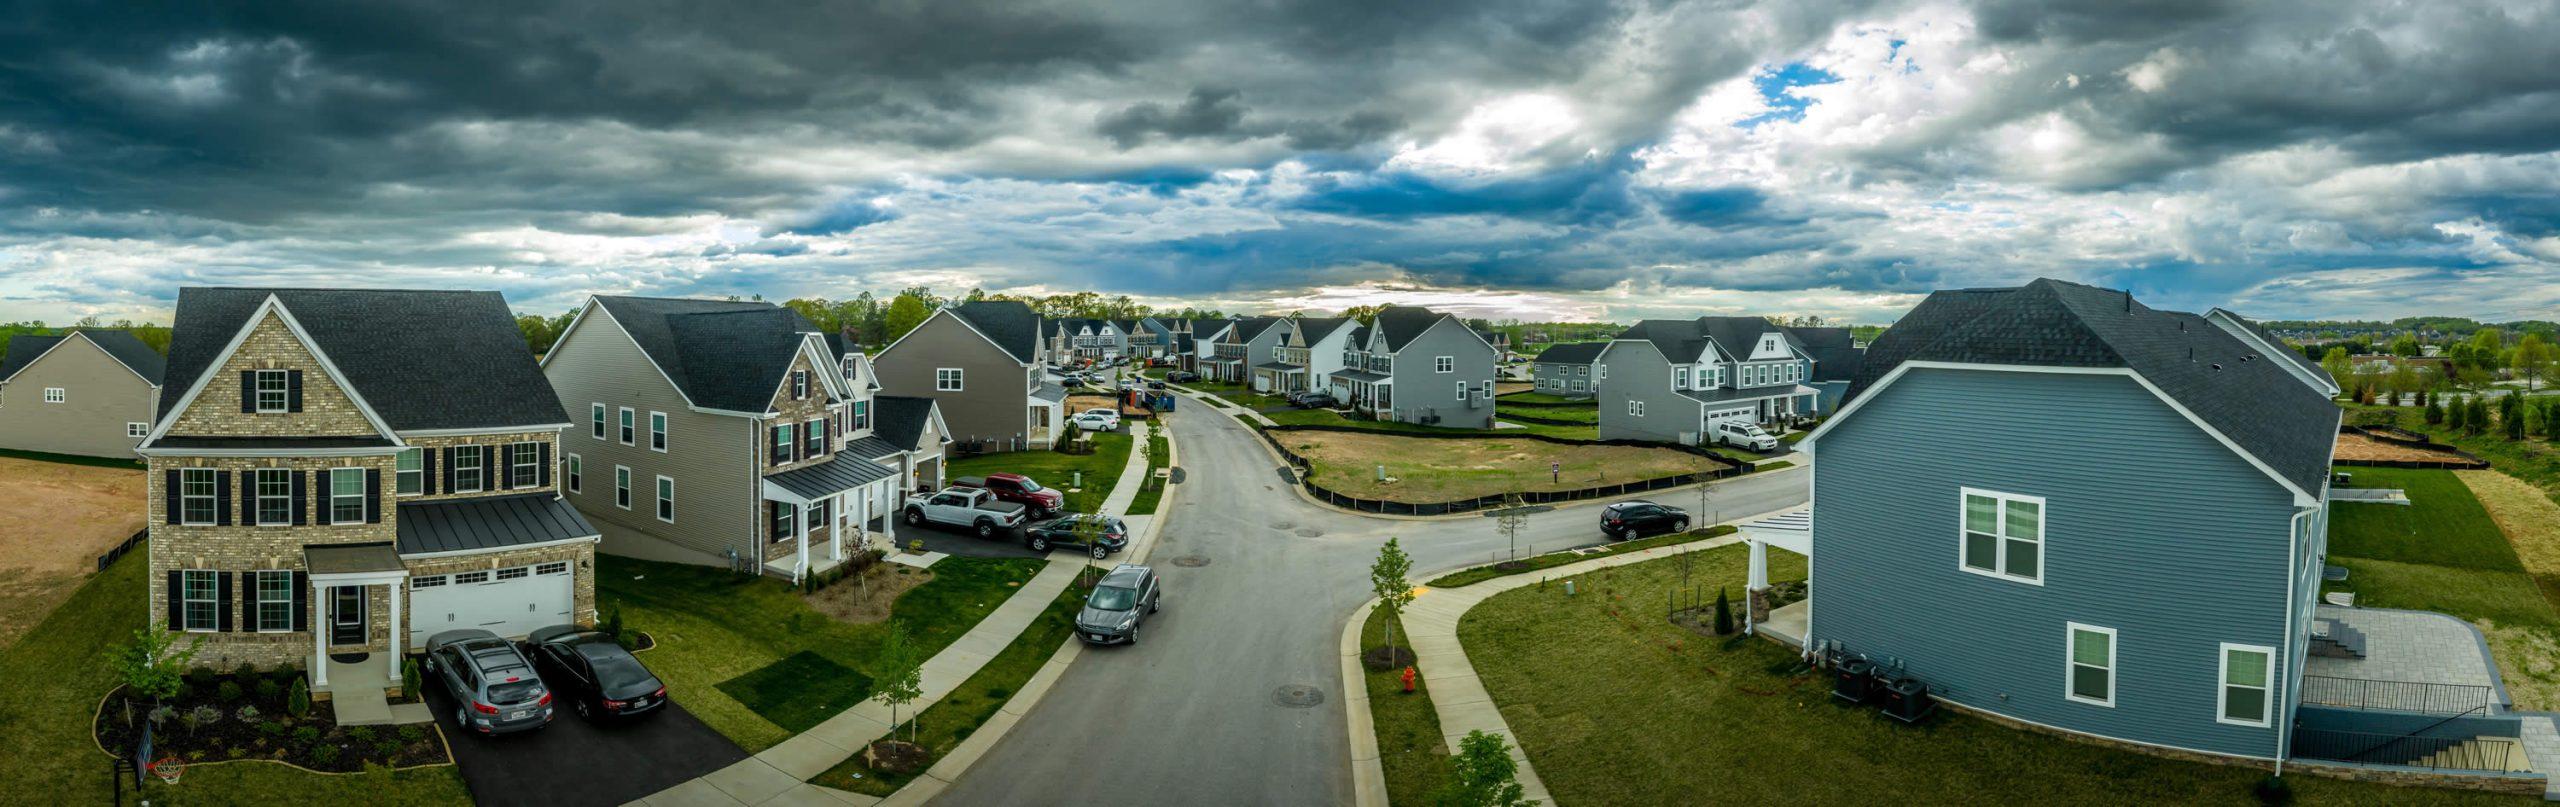 Roofing Installation in the Neighborhood